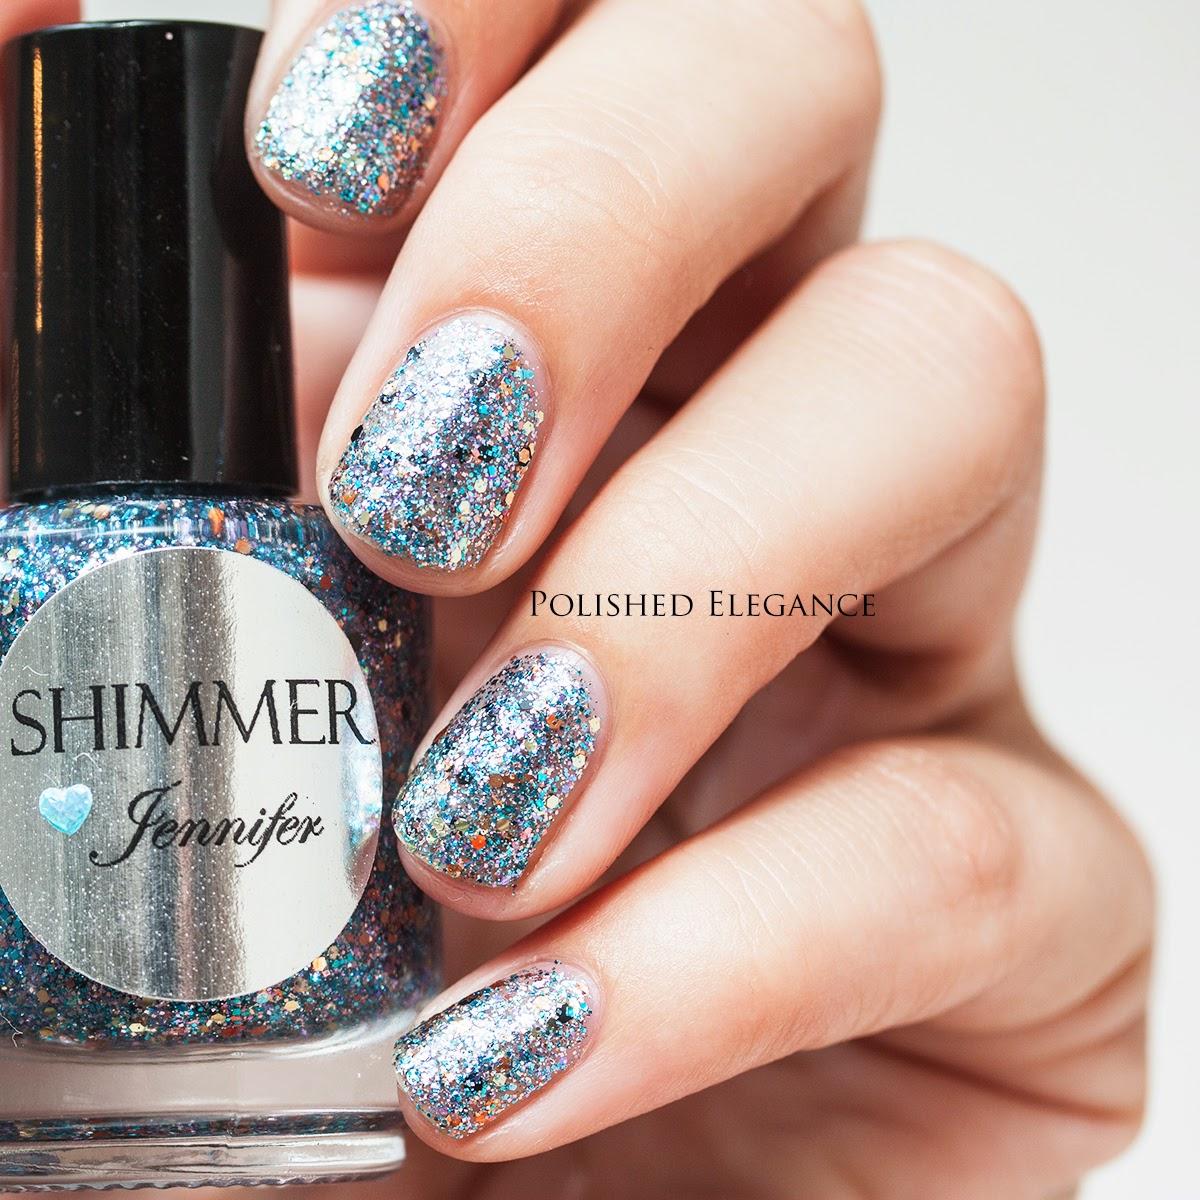 Shimmer Polish - Jennifer swatch review nail polish glitter nail polish